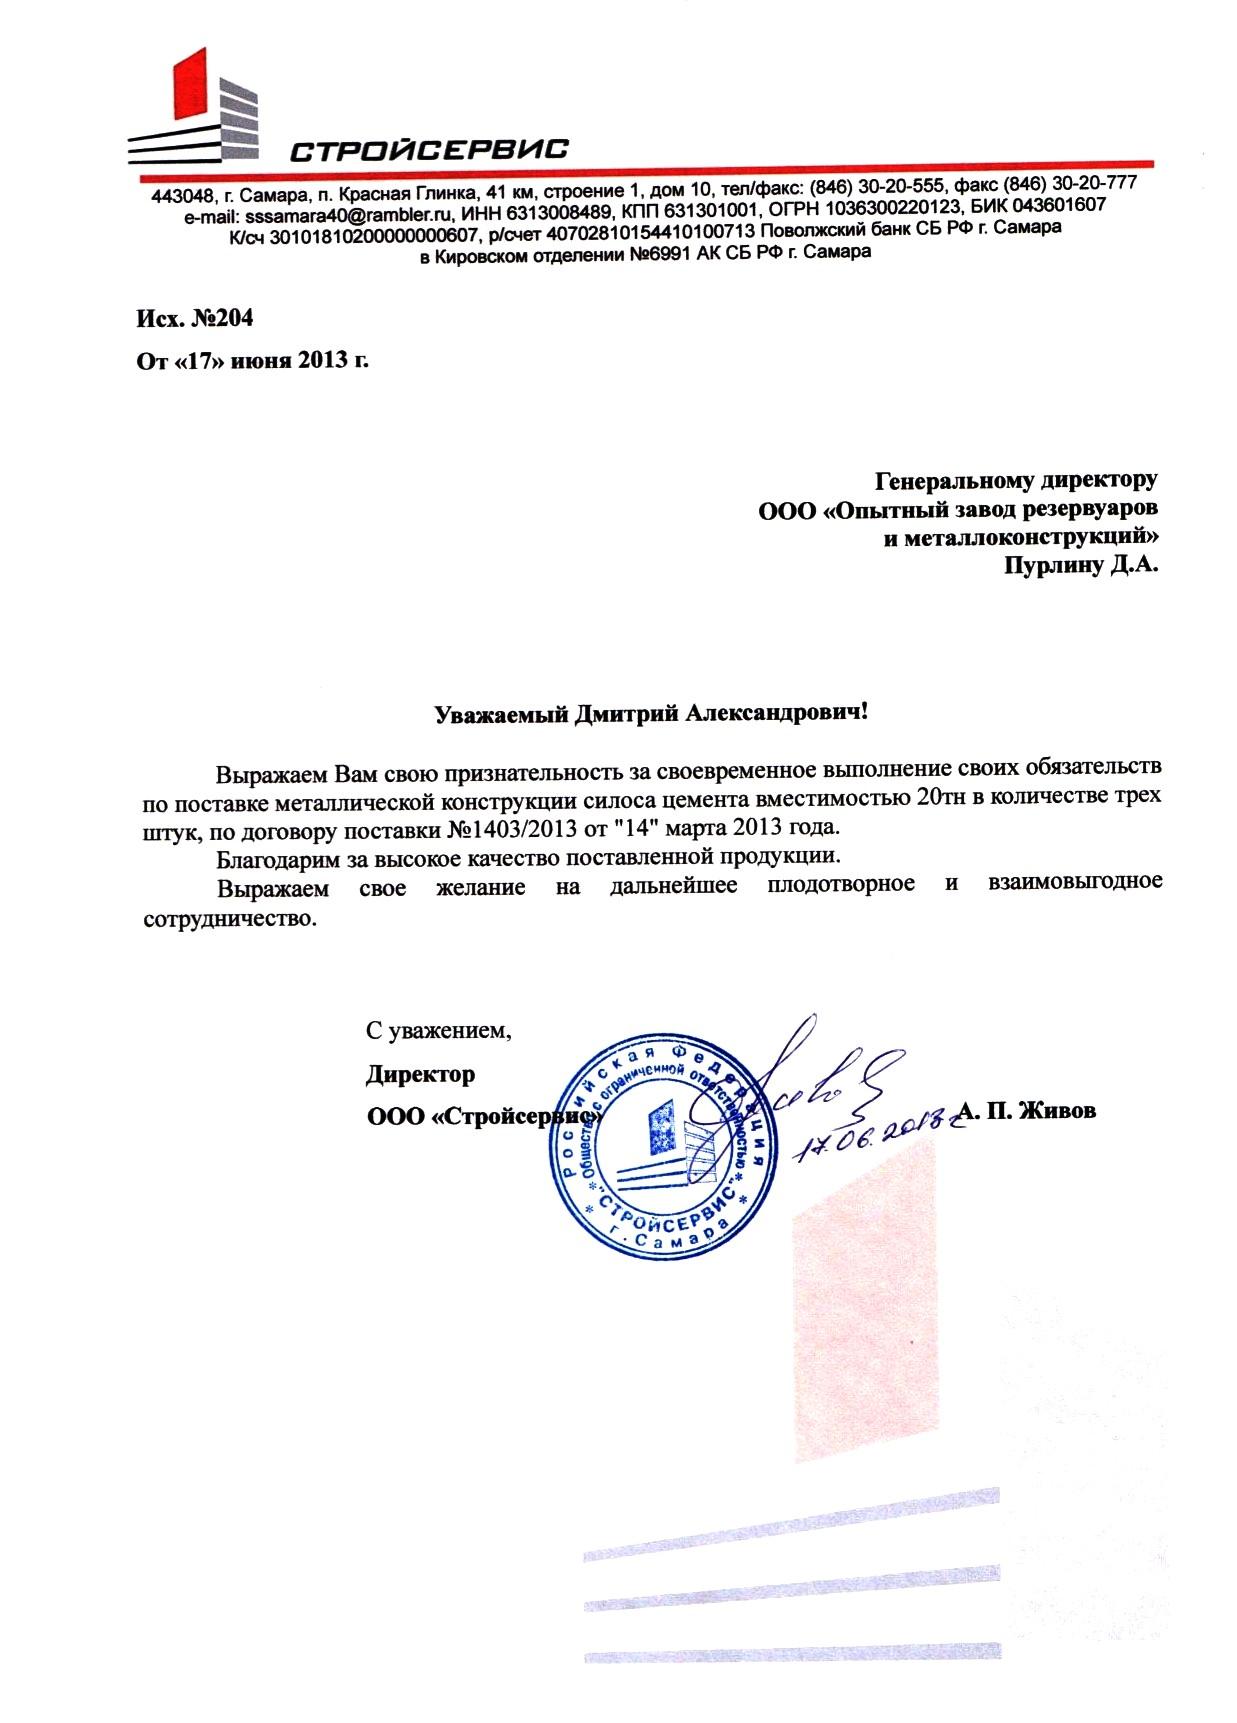 Отзыв ООО Стройсервис